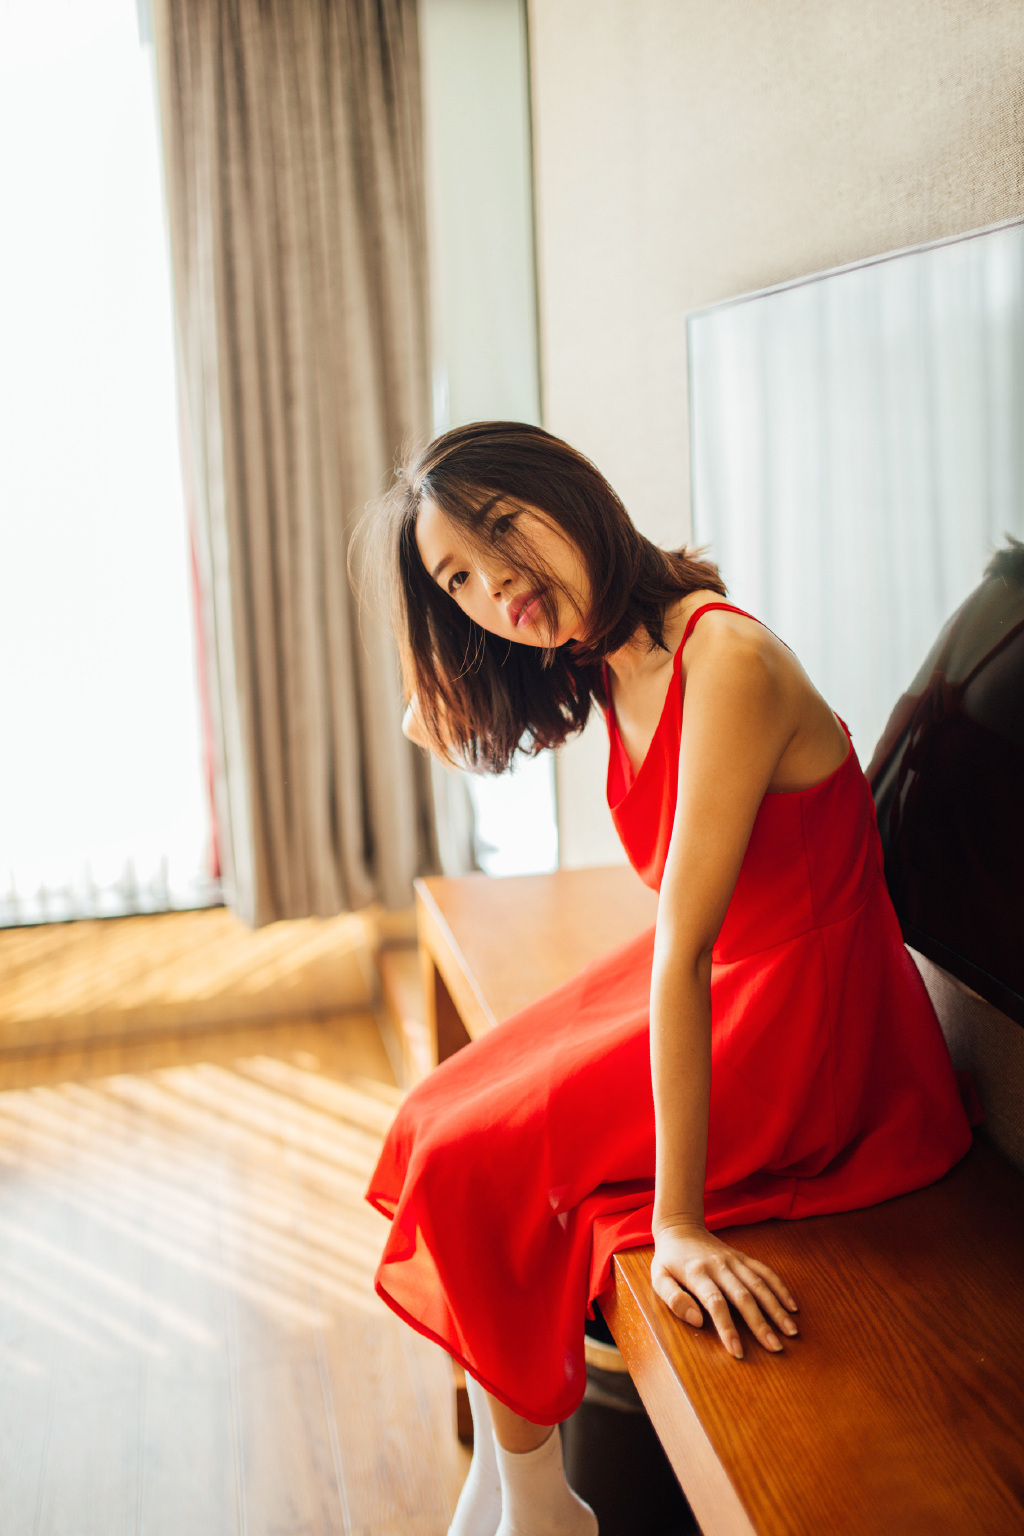 7BBI-186亚洲嫩模晴晴丁字内裤黑丝翘臀美女私密部位自拍高清图片